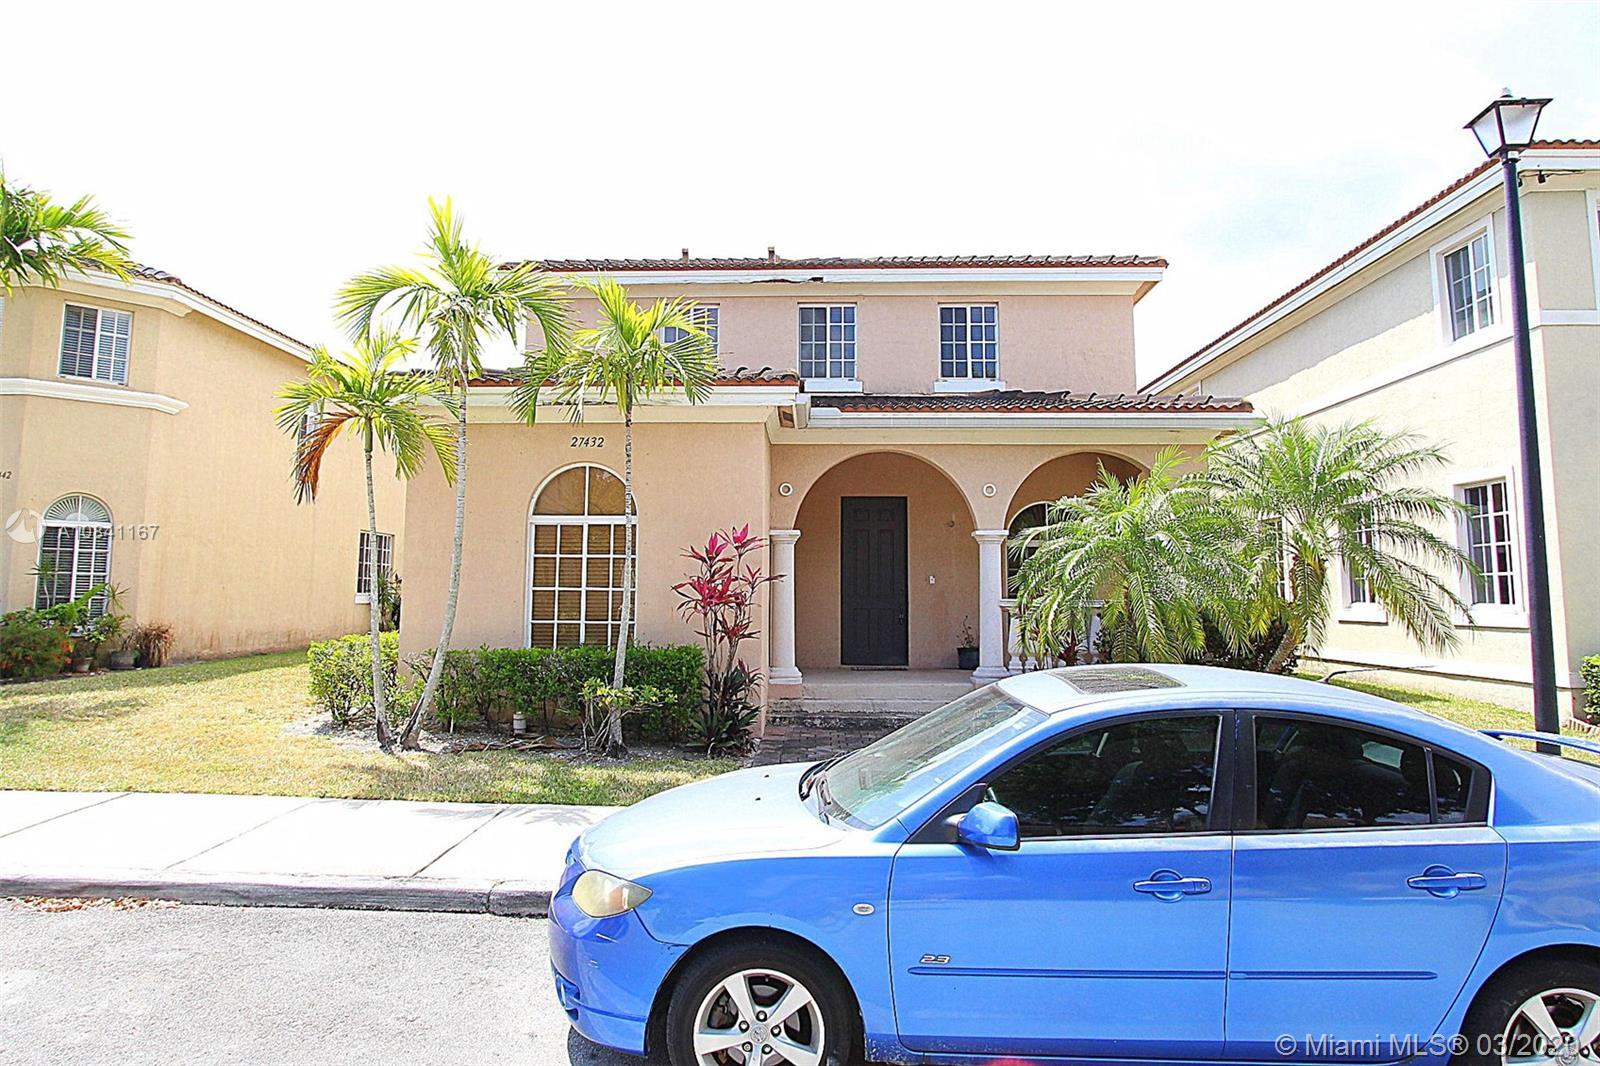 27432 SW 139th Pl, Homestead, FL 33032 - Homestead, FL real estate listing